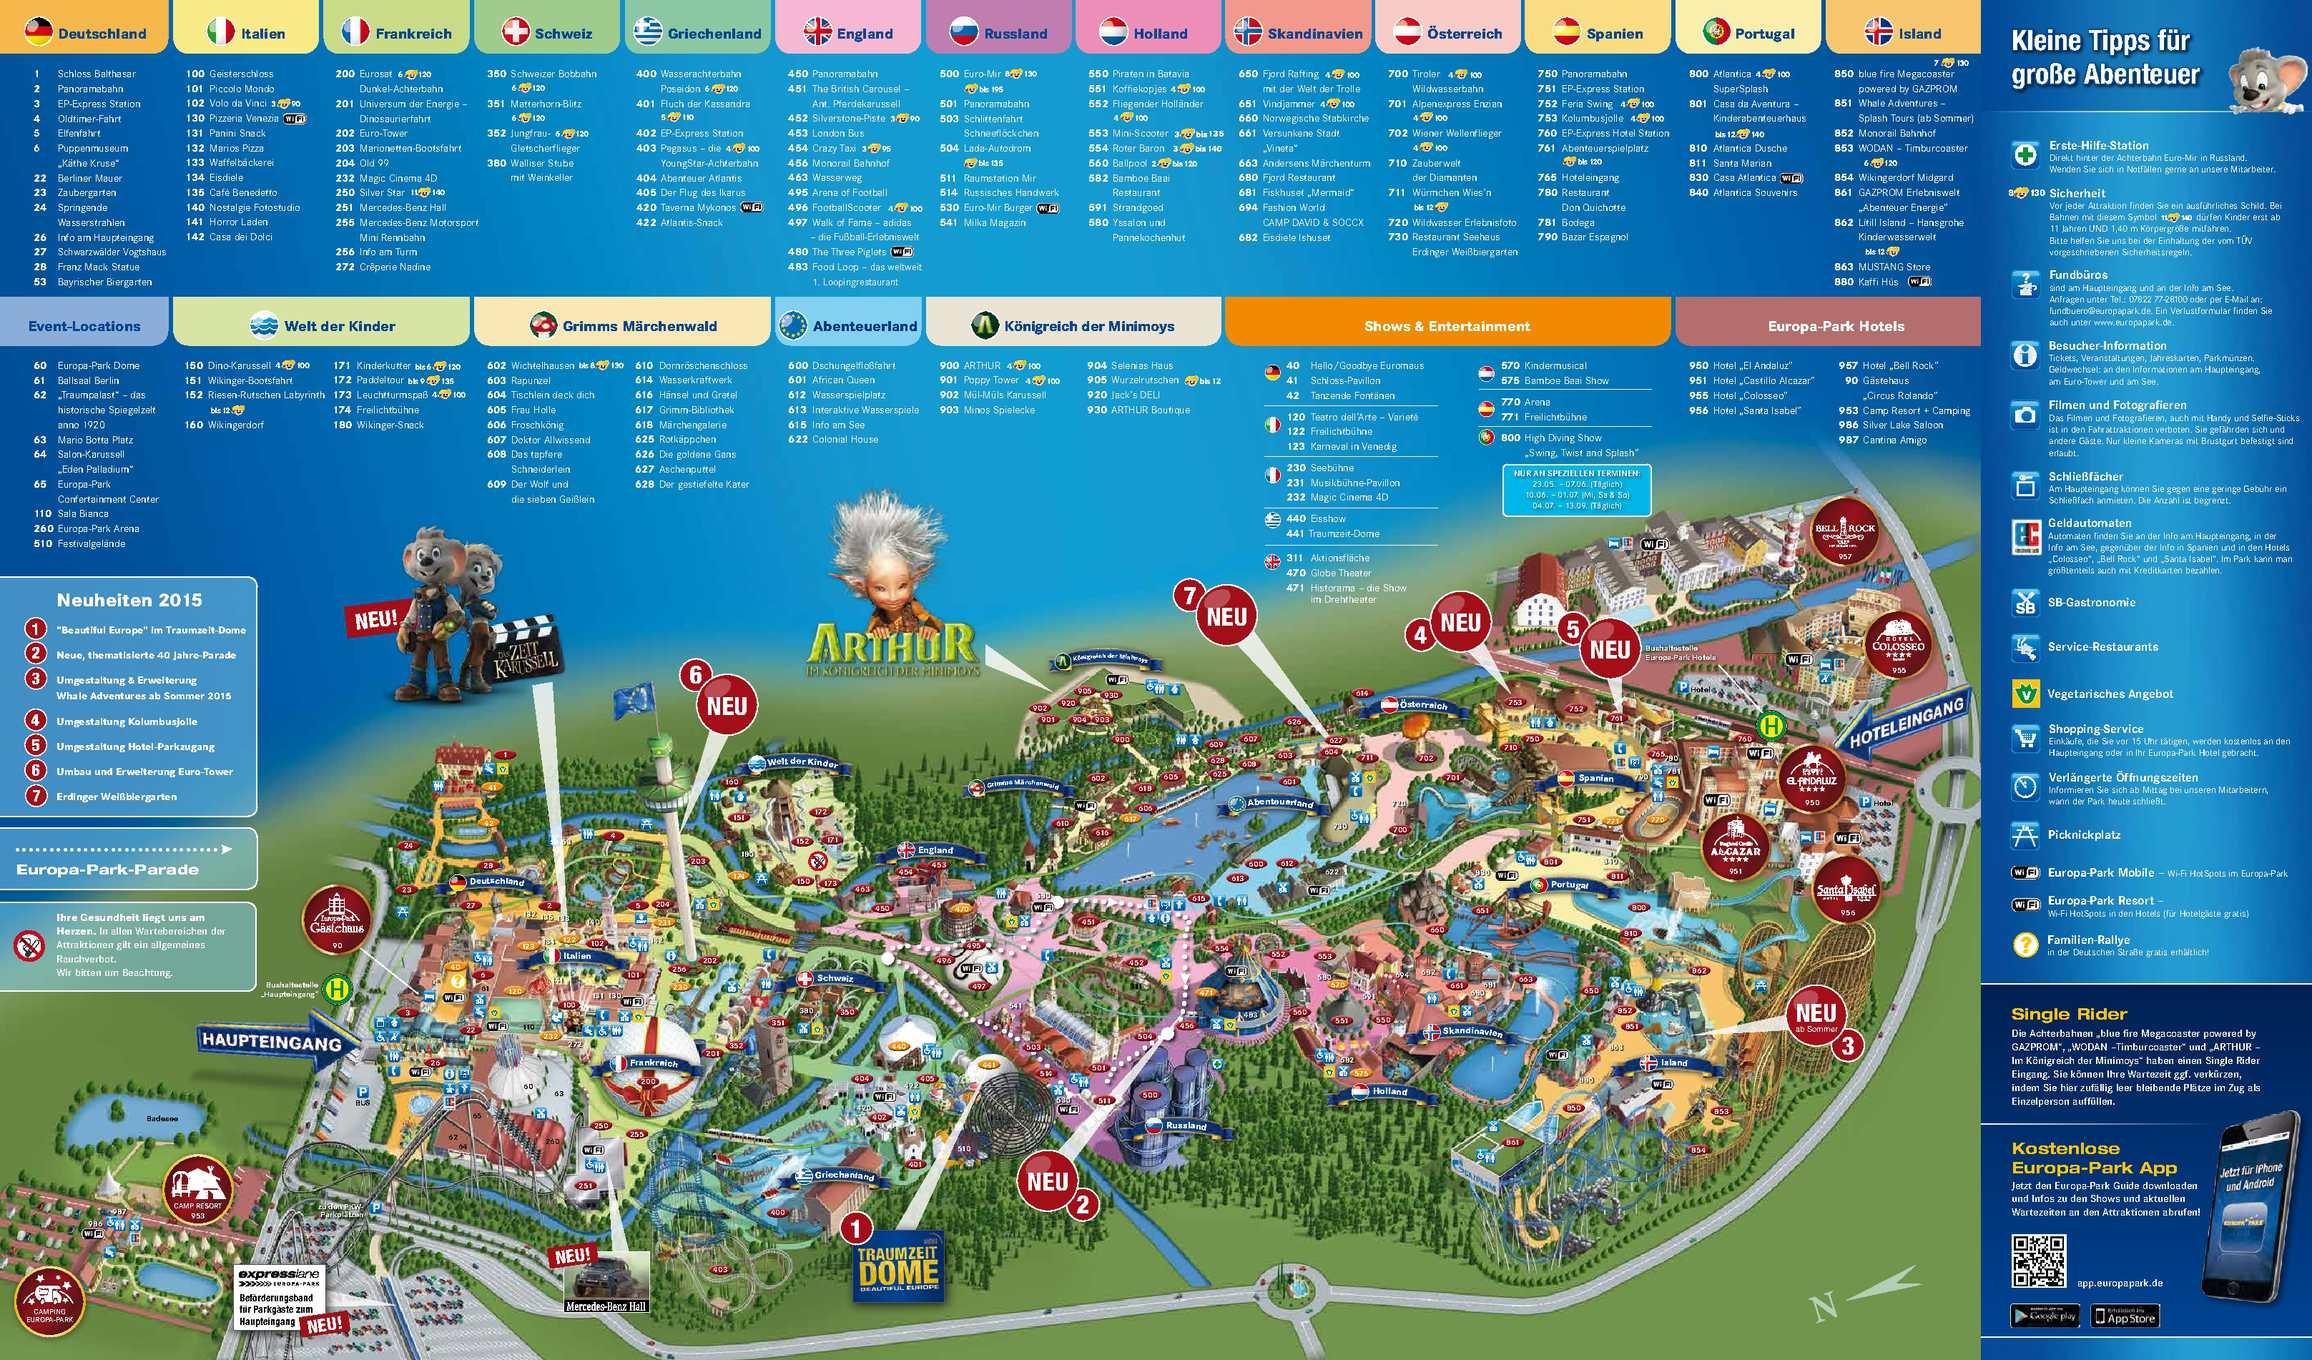 Europa Park Karte.Calameo Parkplan Europa Park 2015